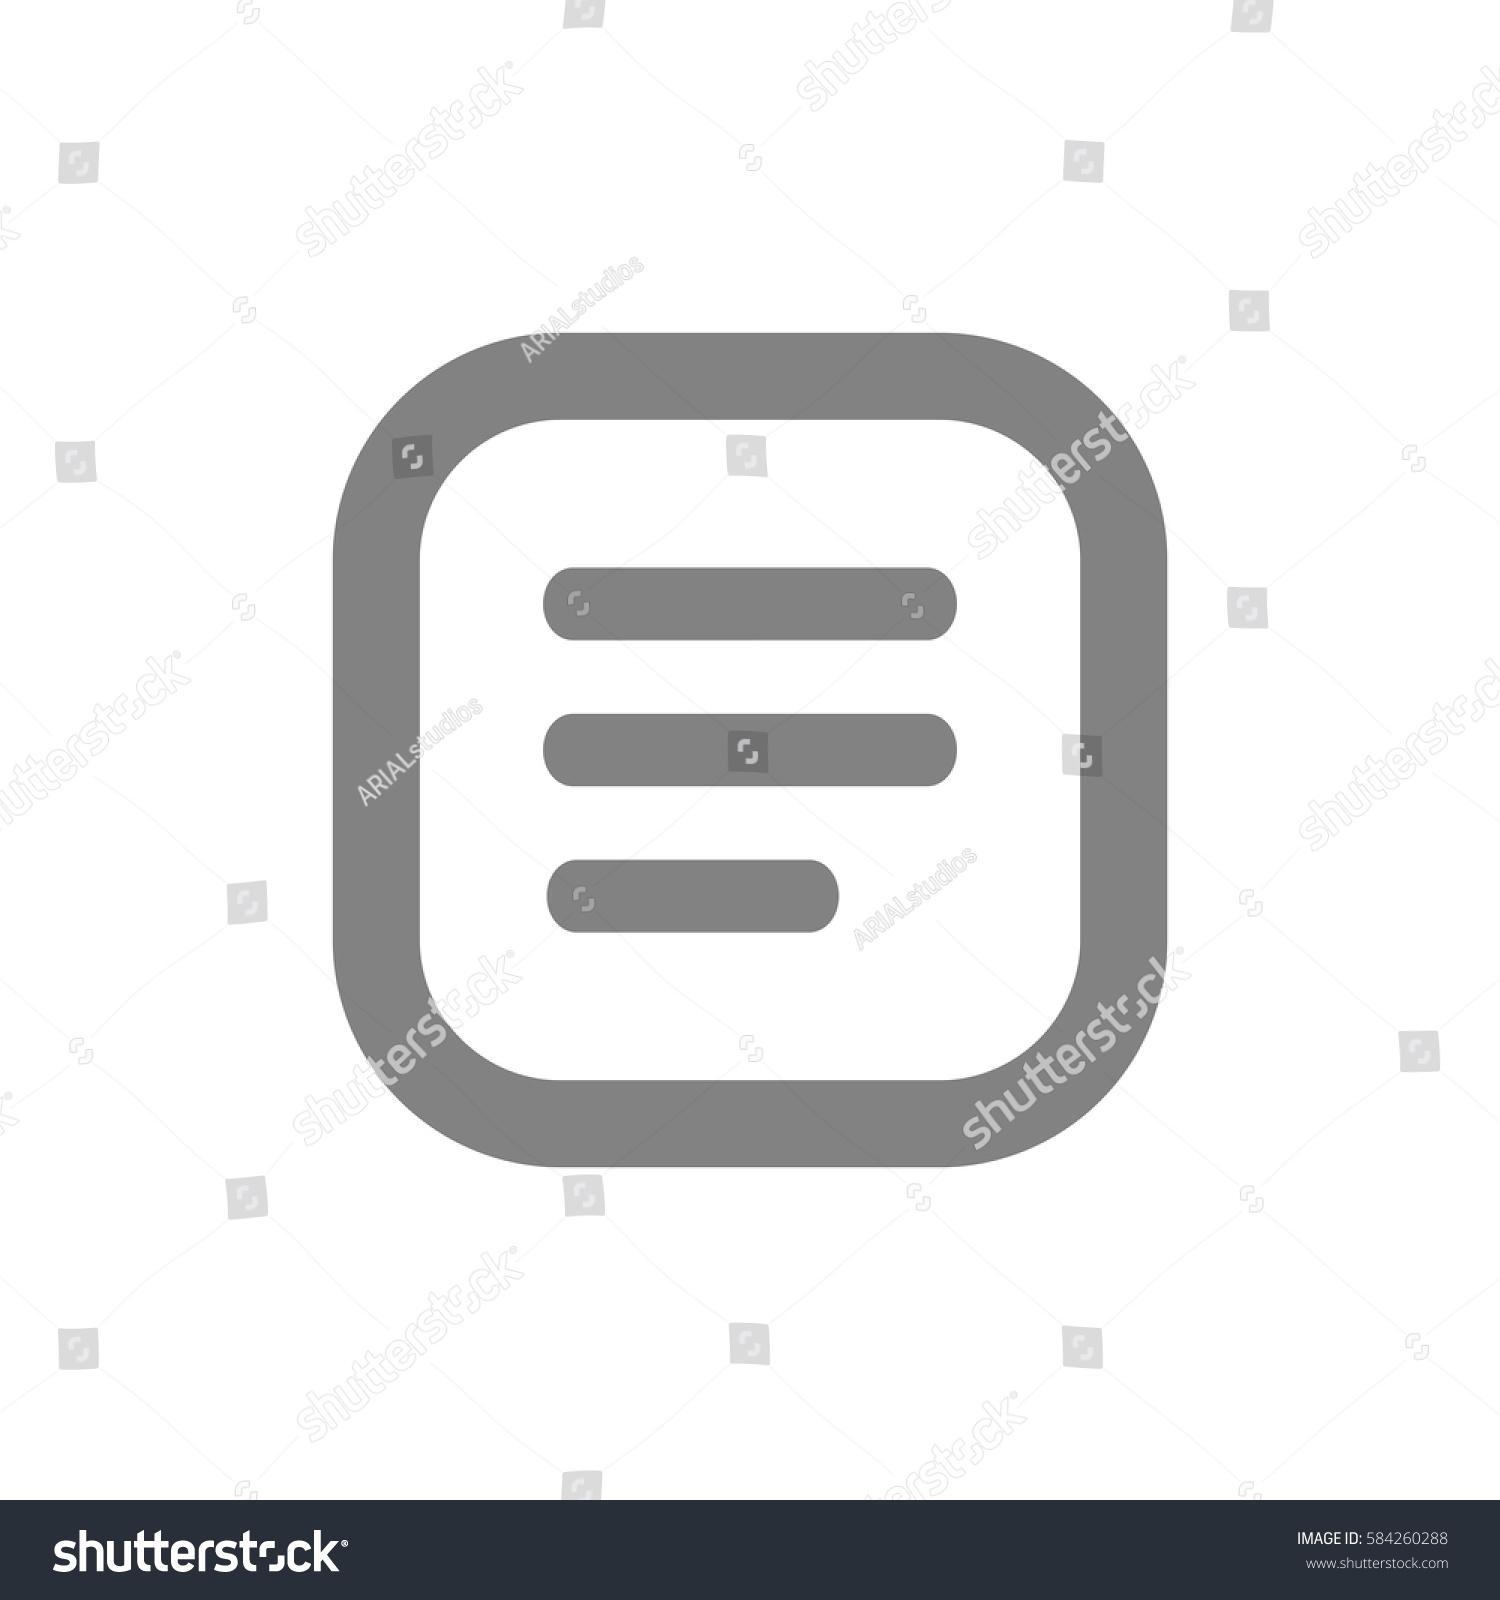 memo logo design stock vector 584260288 shutterstock memo logo design